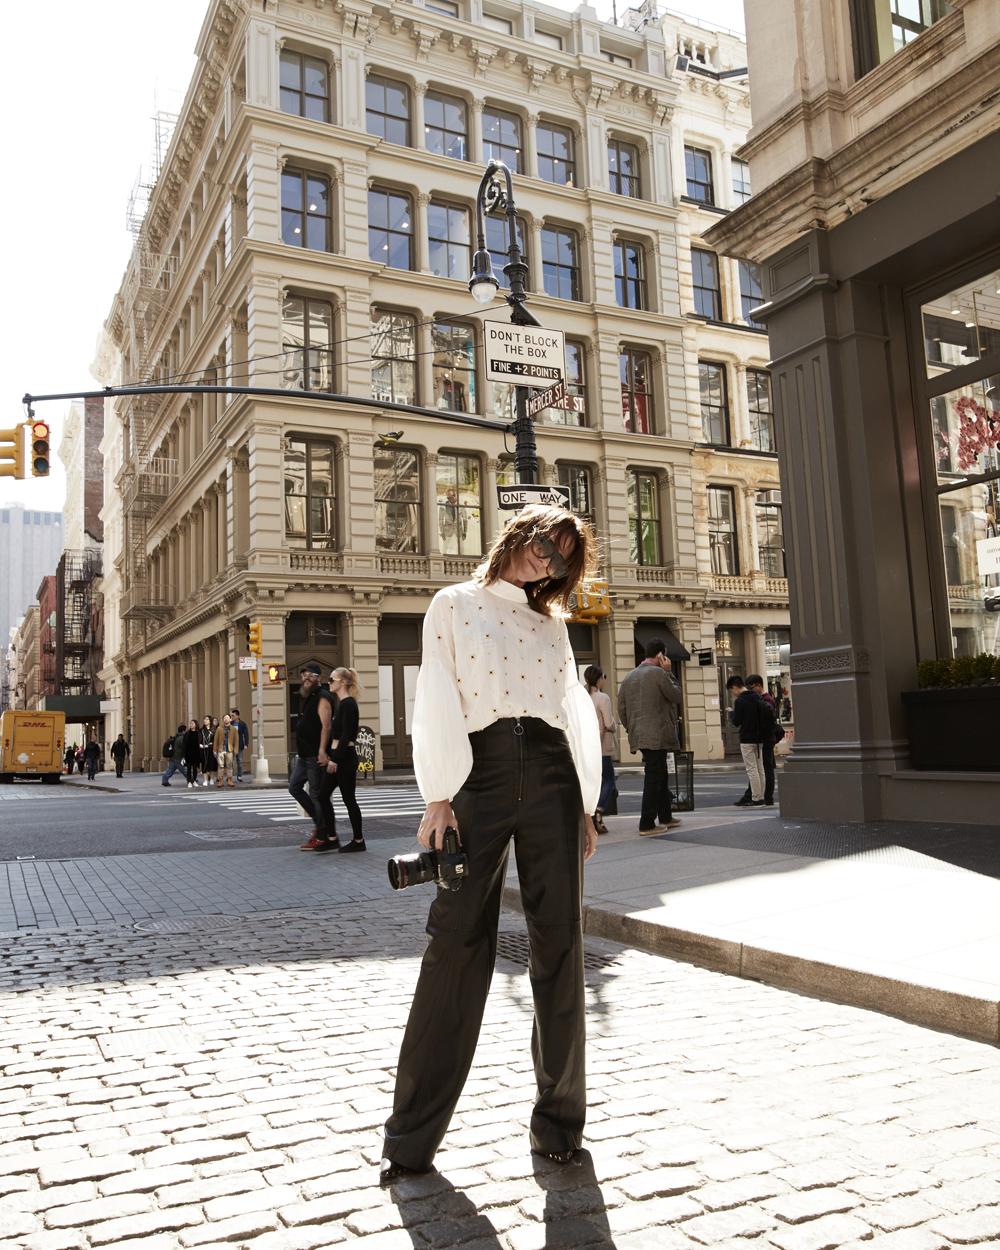 Tibi, Tibi Blouse, Tibi Pants, Leather Pants, Tiffany & Co, Tiffany Jewellery, Tiffany Jewelry, tiffany NYC, New York, NYC, Outfit, Street Style, Amanda Shadforth, Oracle Fox